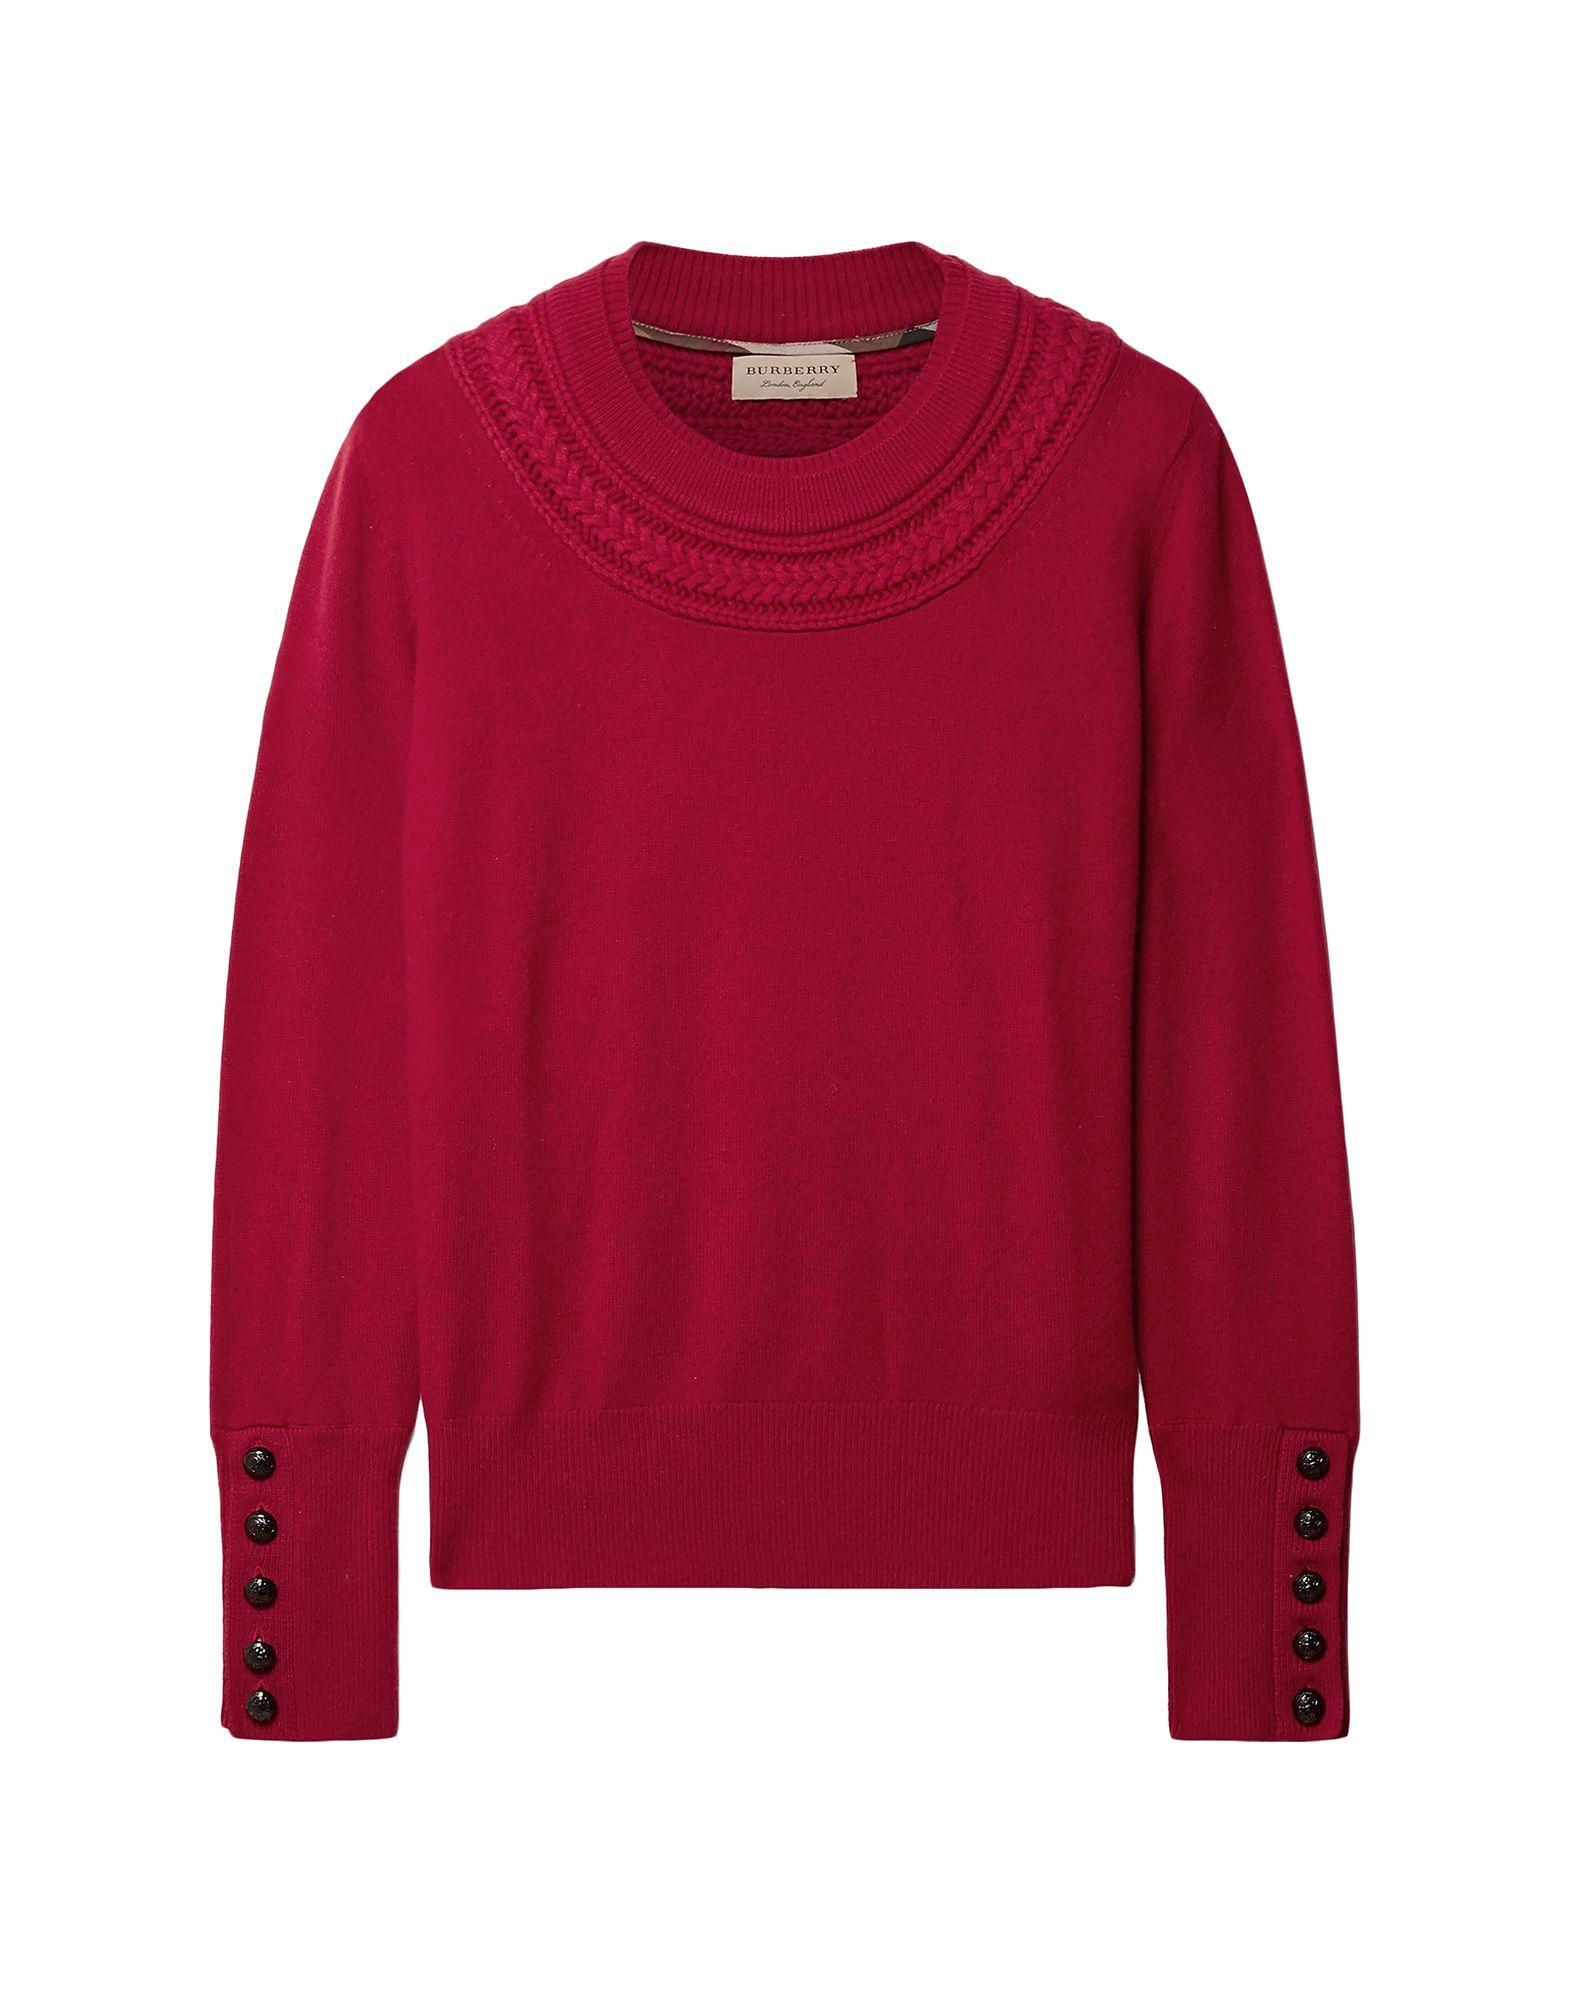 BURBERRY Sweaters - Item 14047653